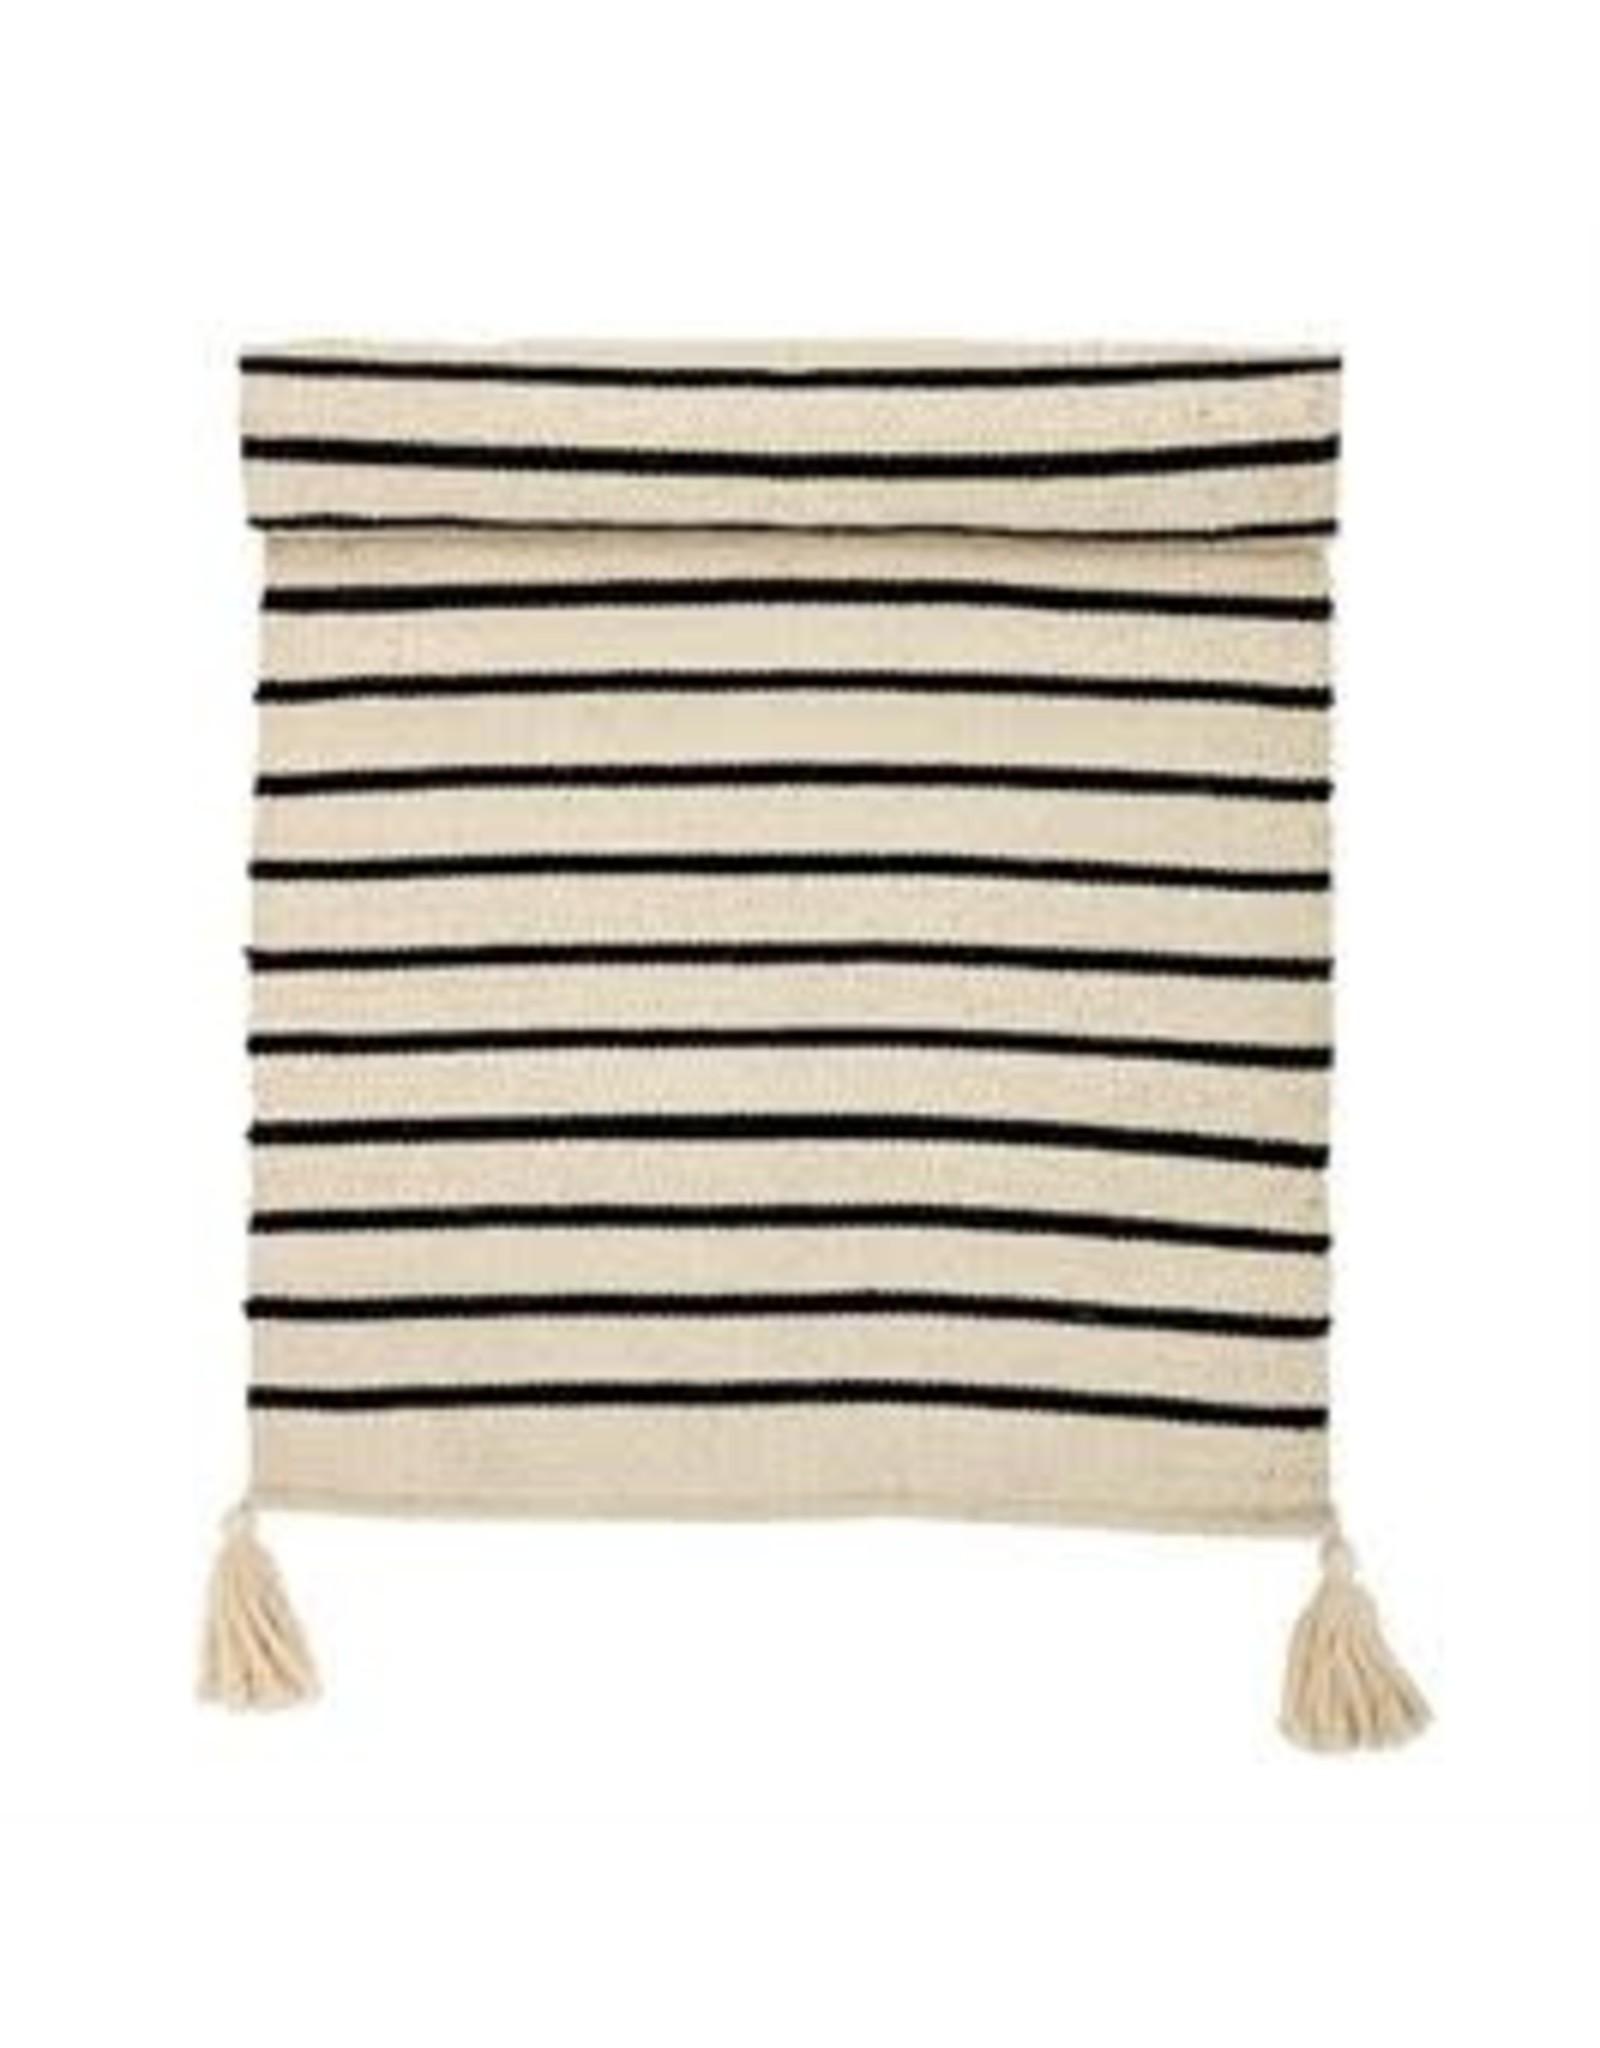 Website Cotton Rug, Cream w/ Black Stripes